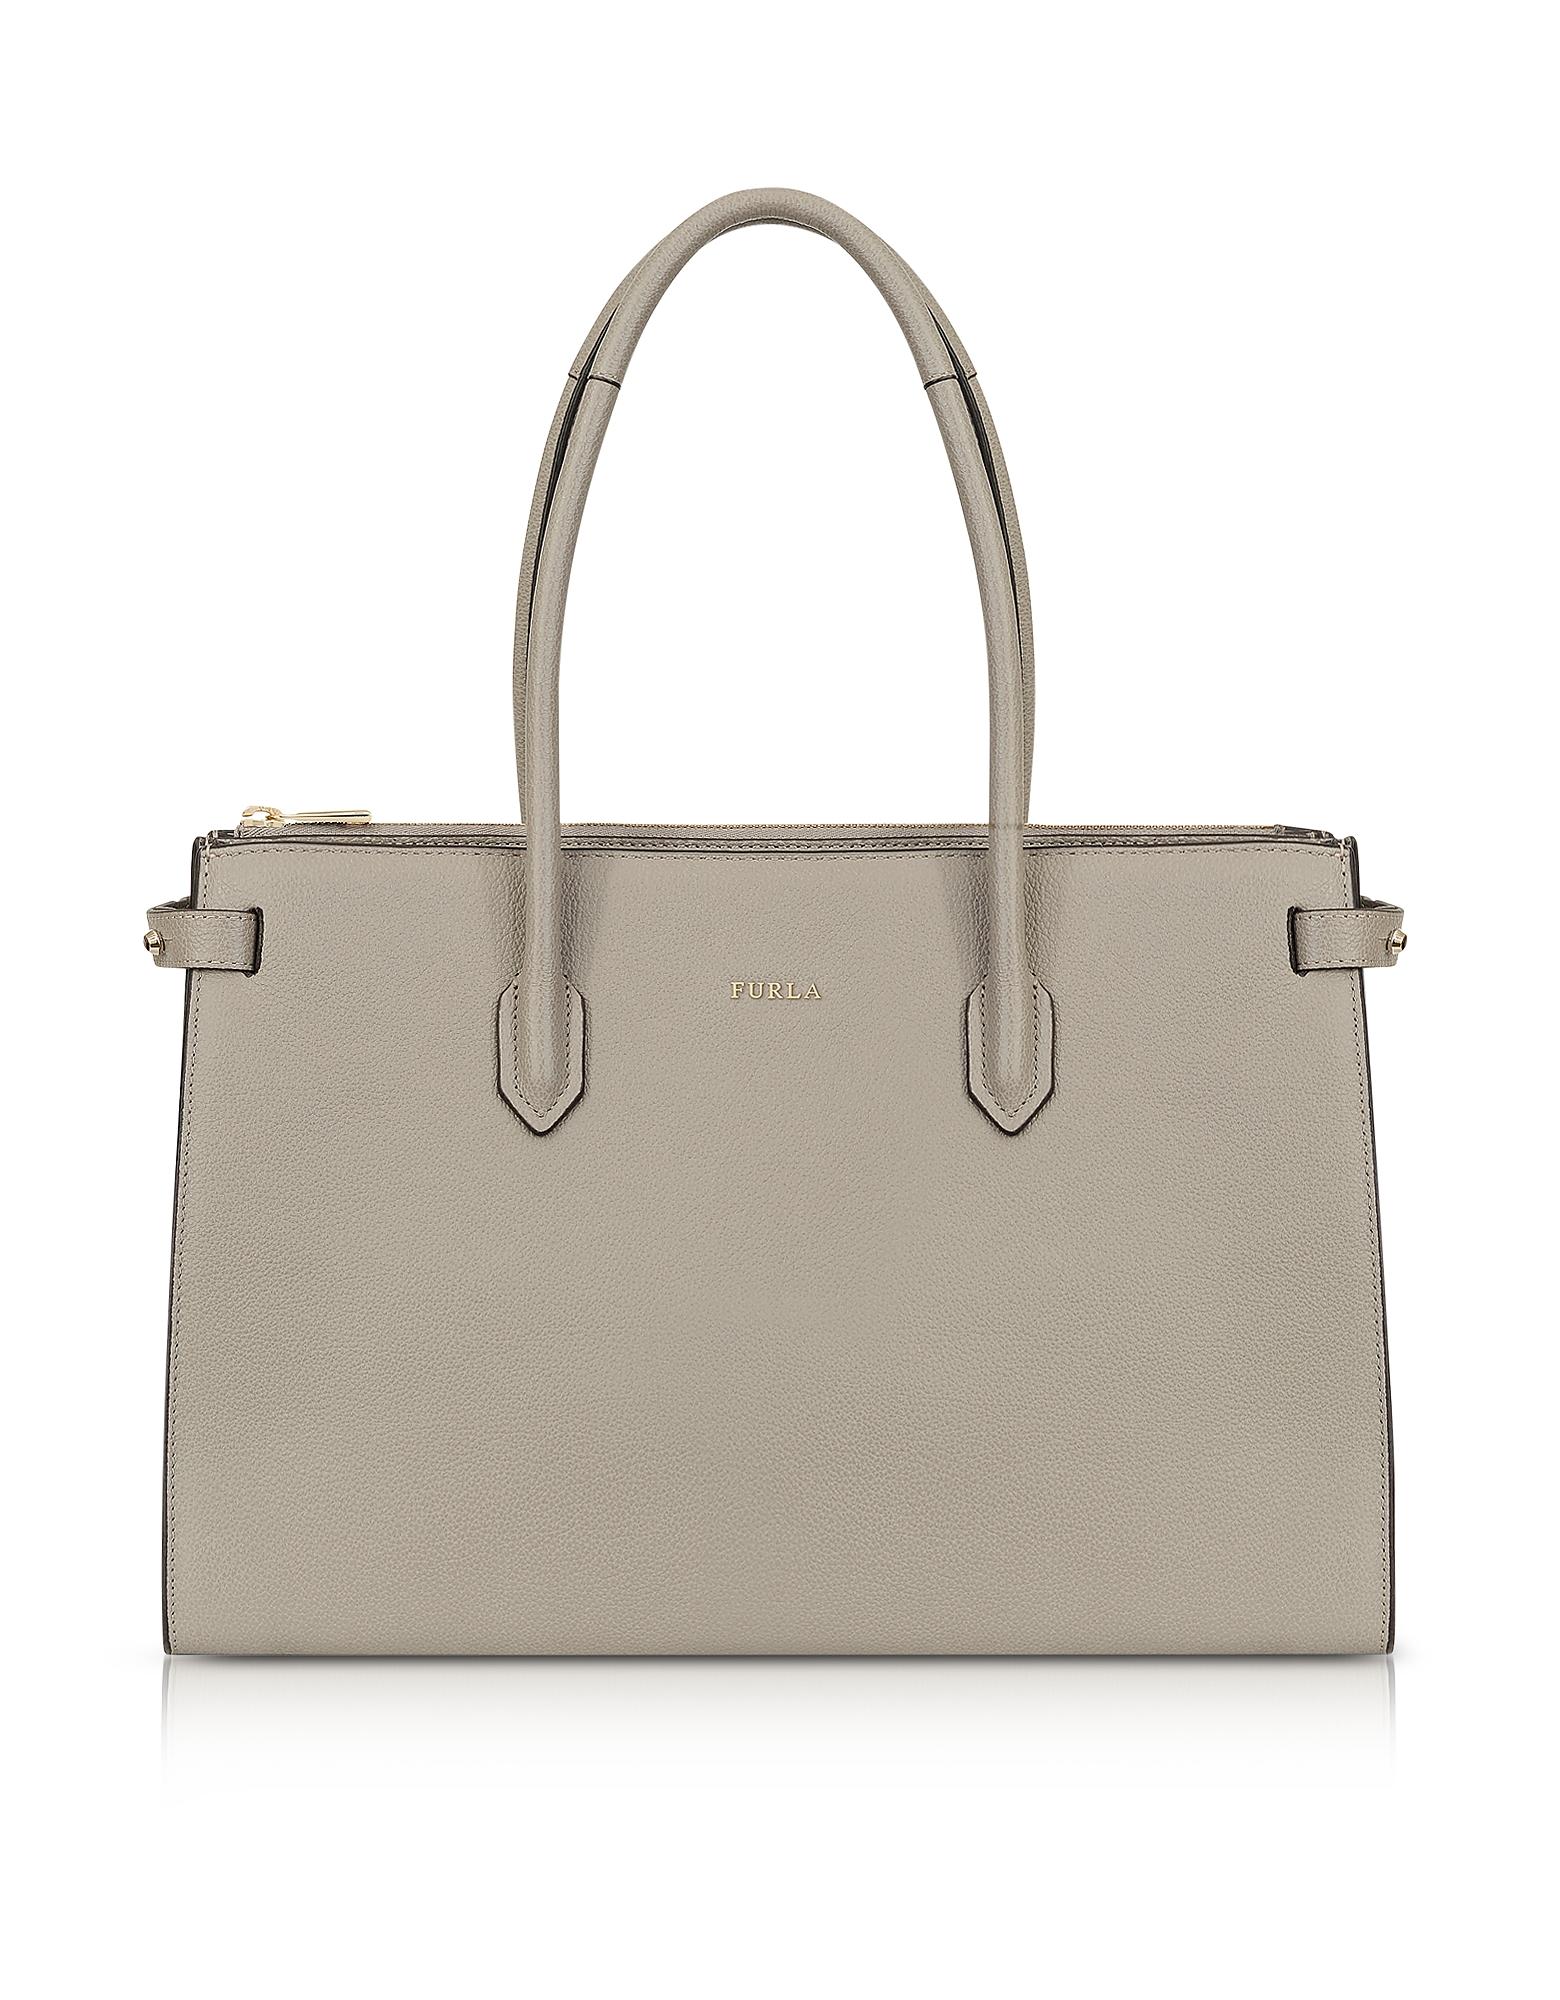 Furla Handbags, Sand Leather E/W Pin Medium Tote Bag